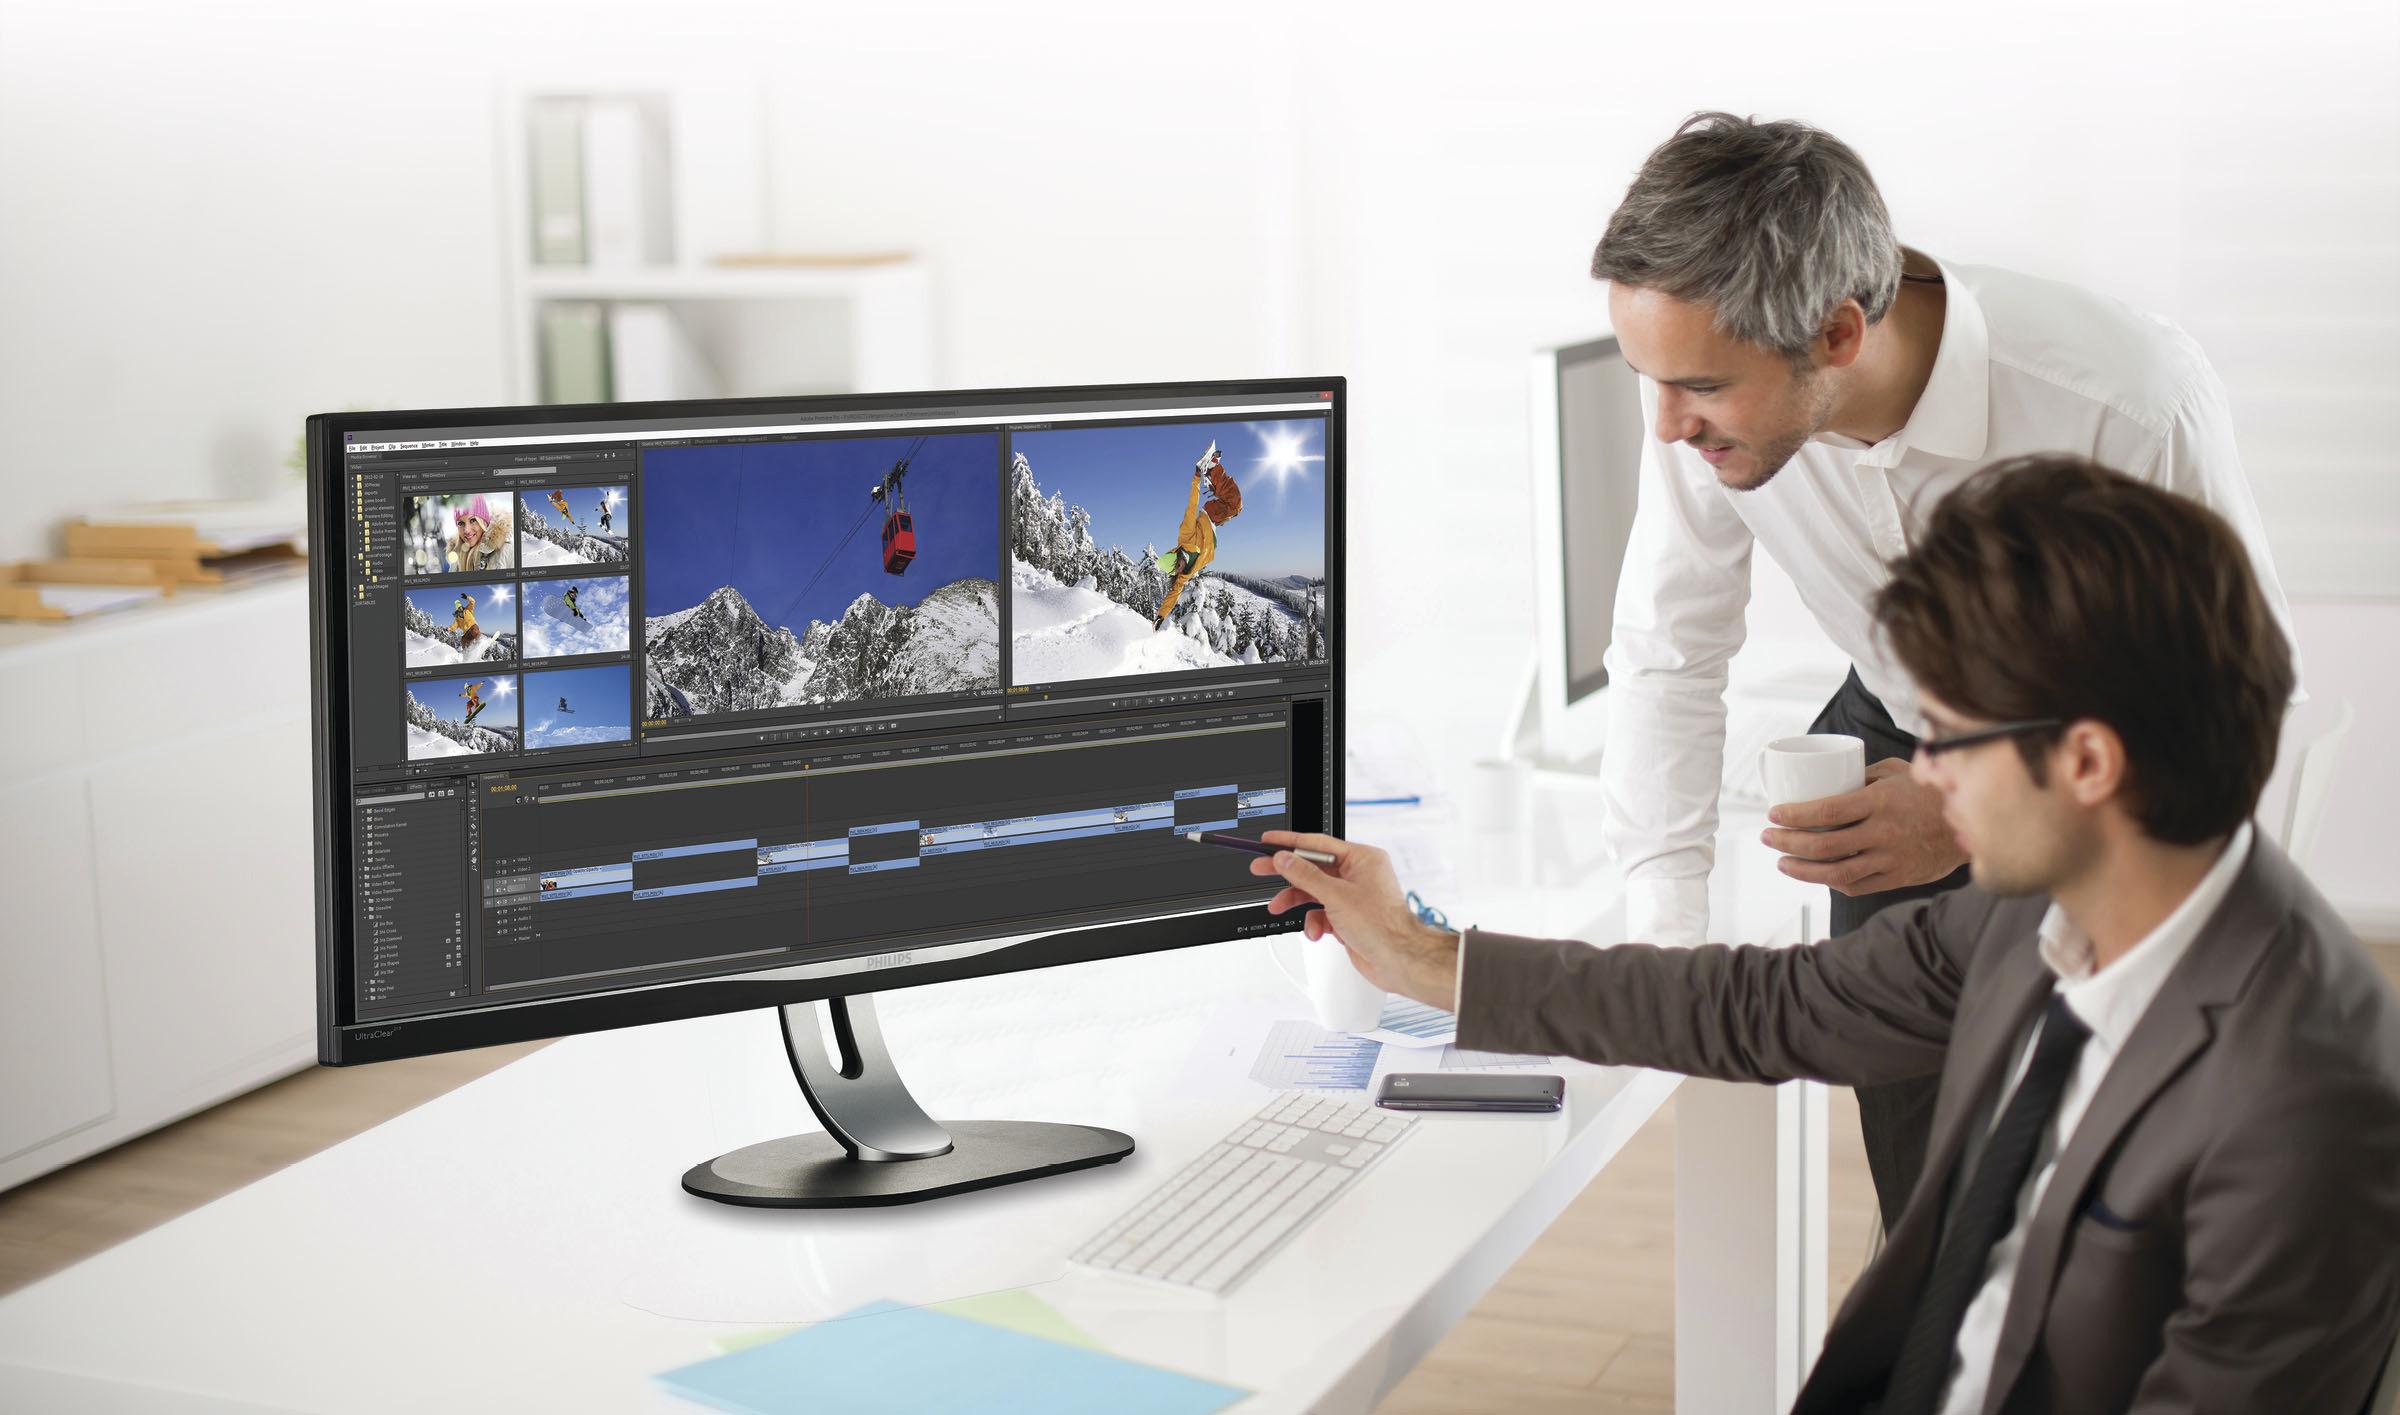 Novi 34 palčni Philipsov panoramski UltraWide zaslon BDM3470UP